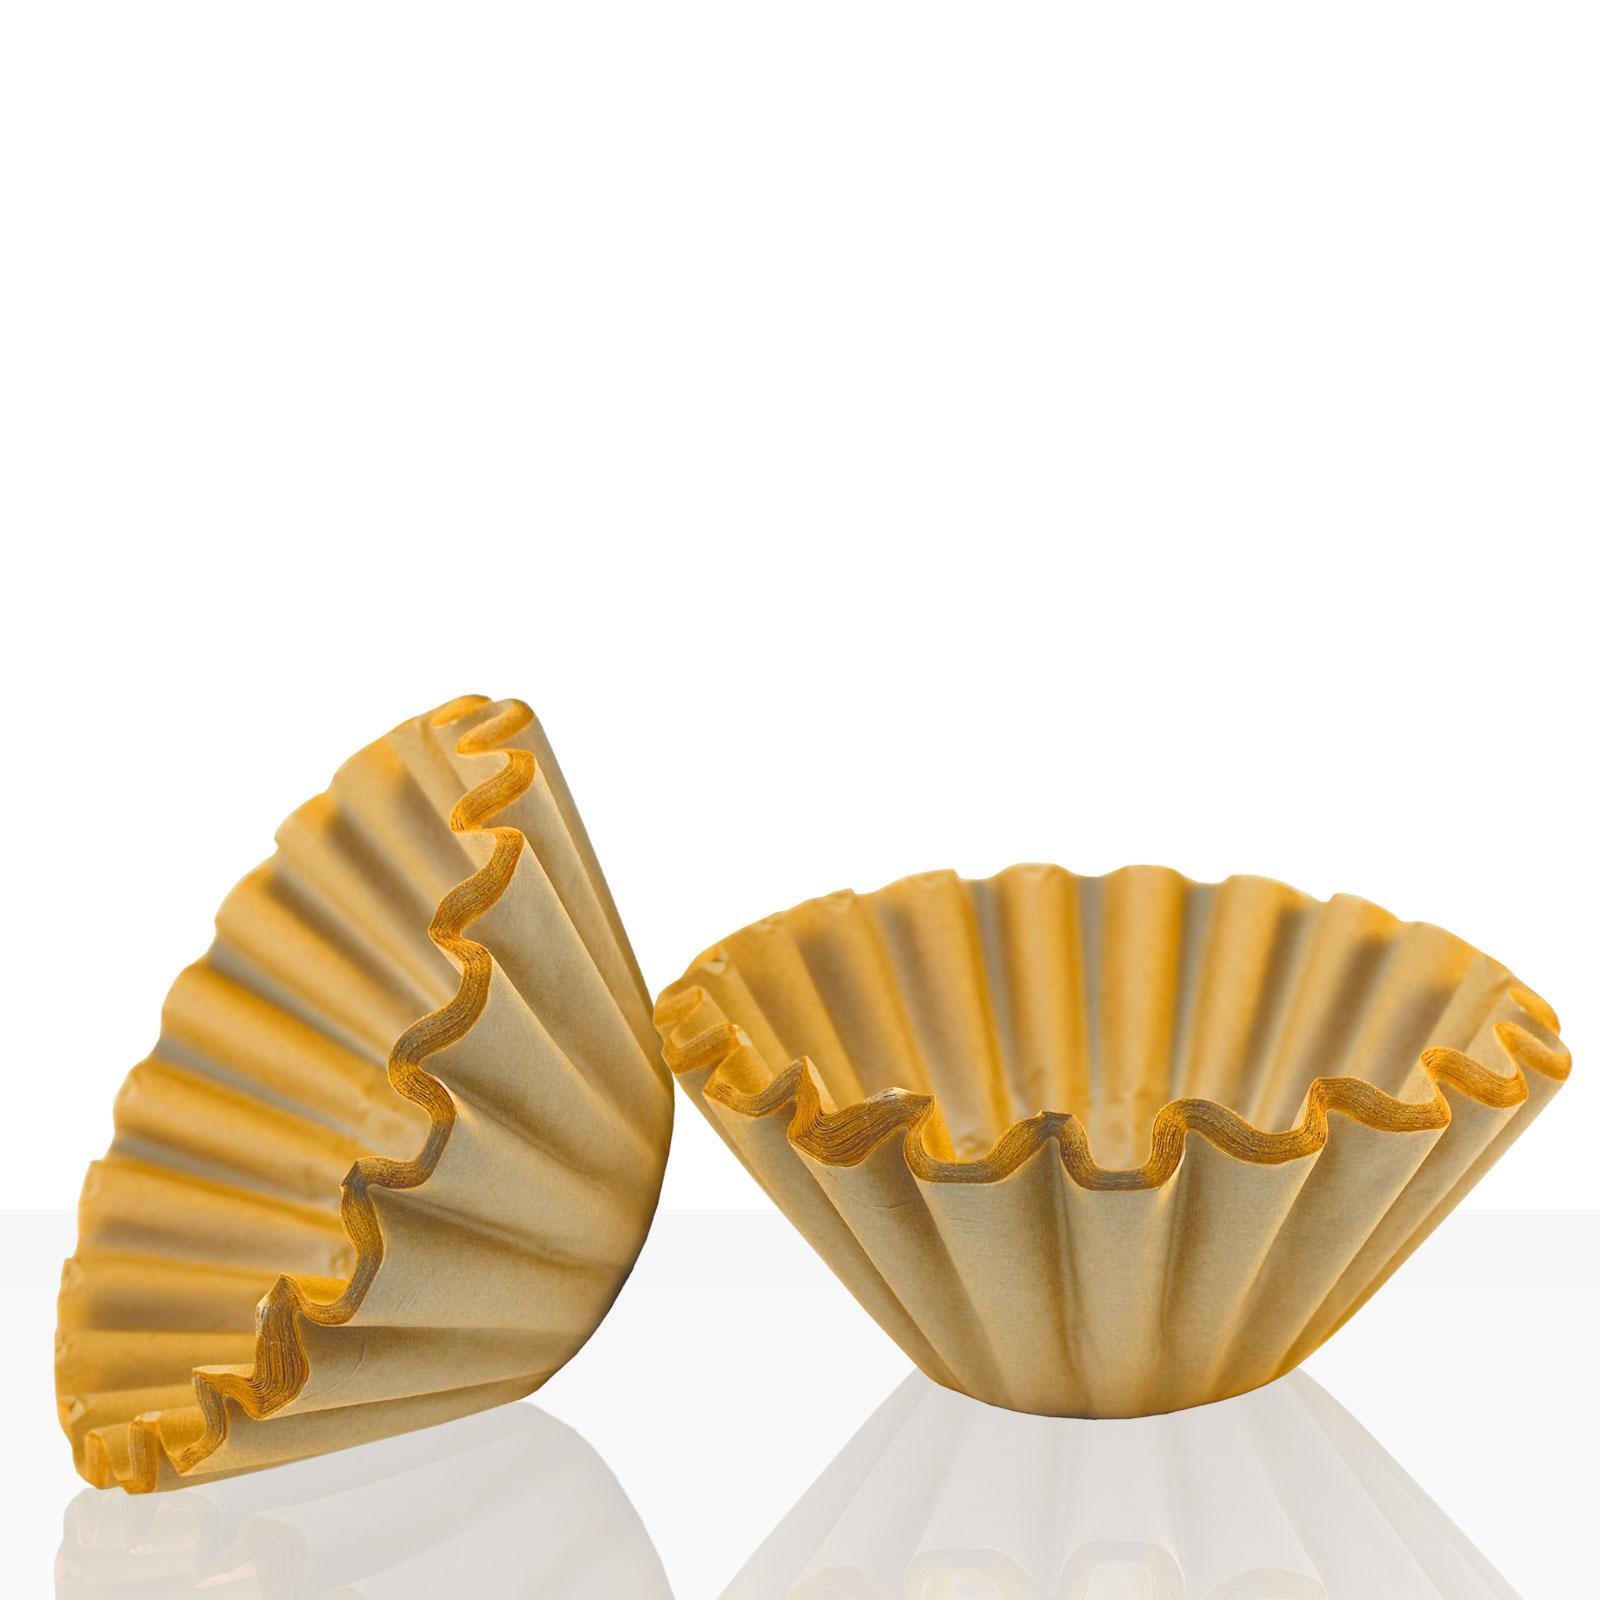 Korbfilter für Bonamat, Bartscher, Animo 85/245 mm, 1000 Stk braun, Kaffeefilter